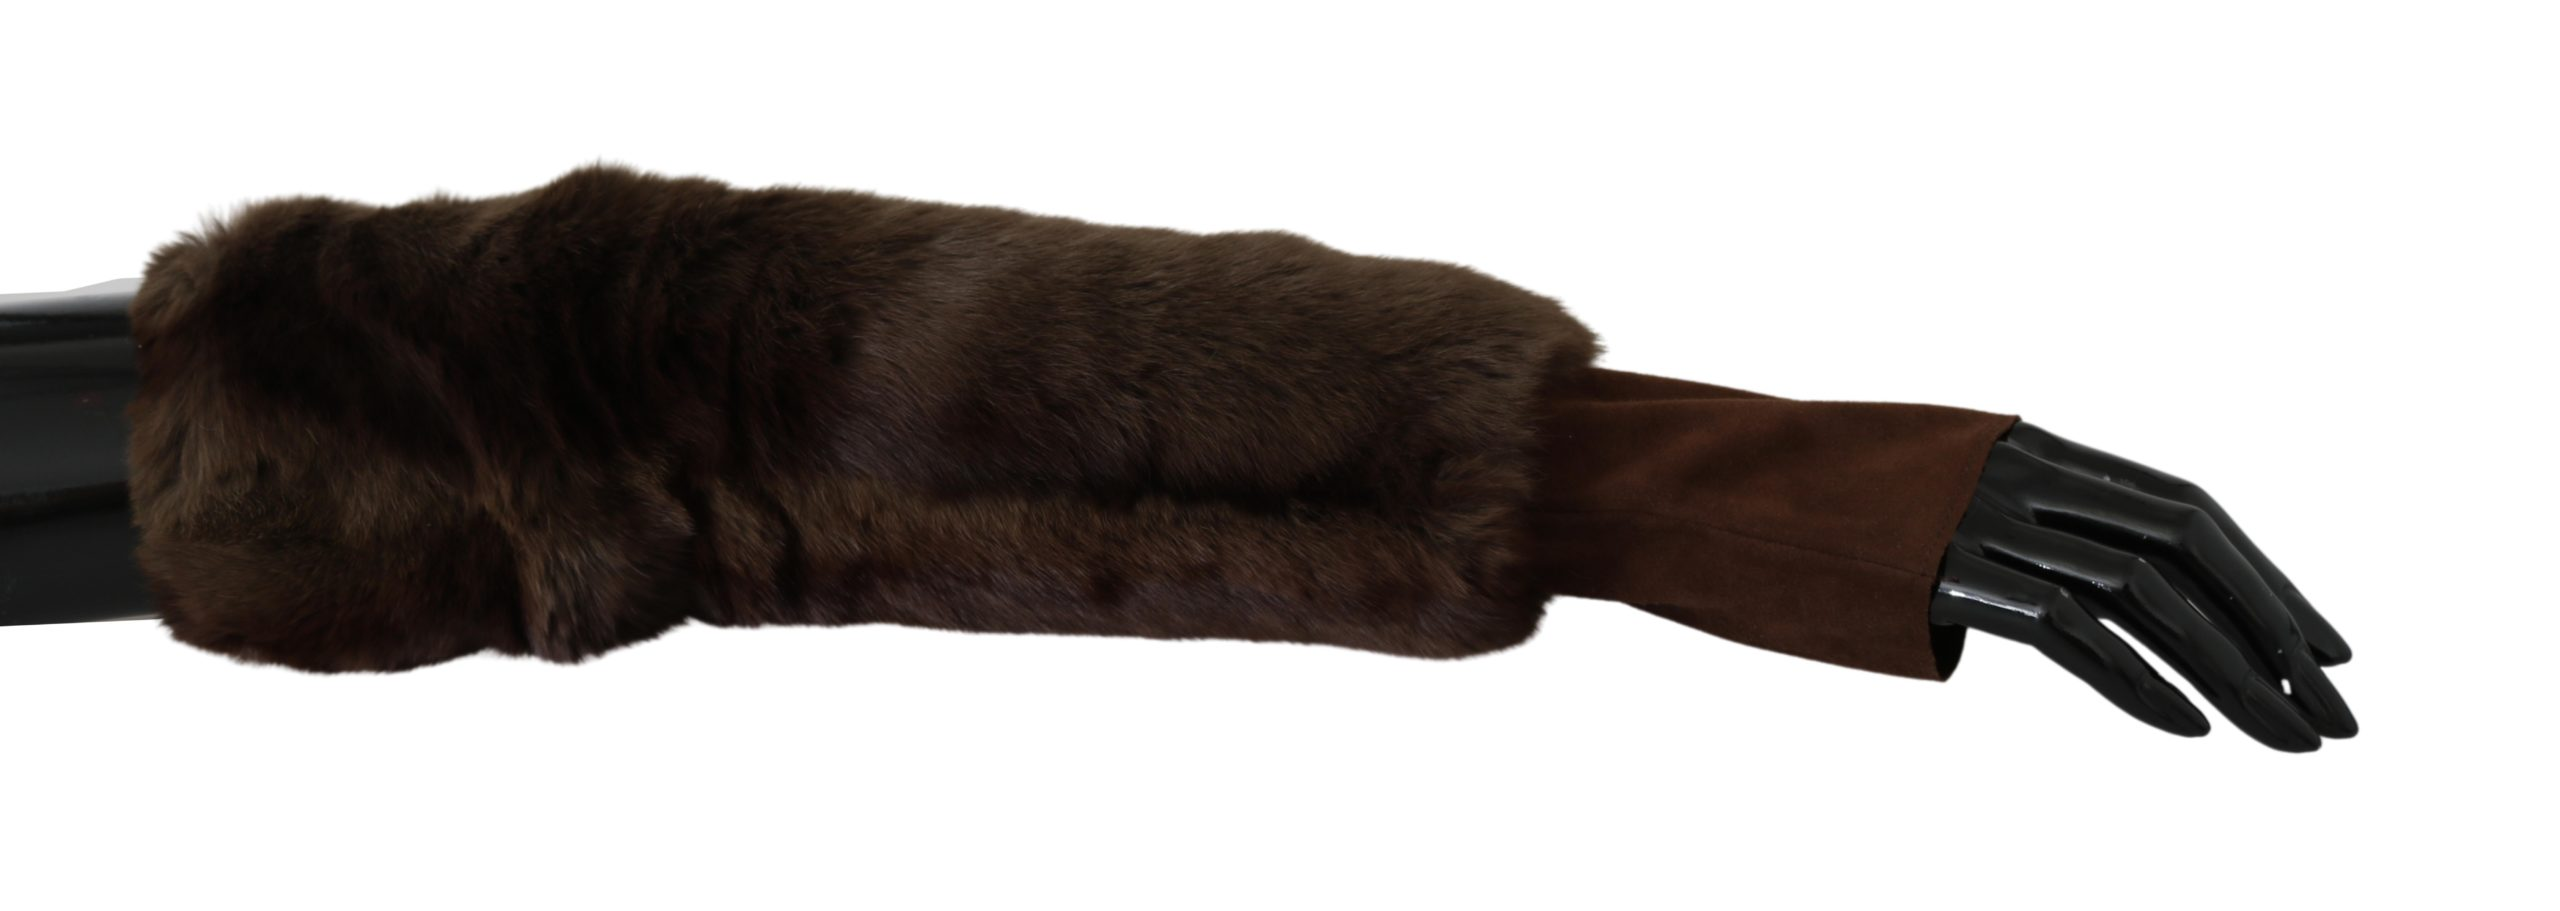 Dolce & Gabbana Women's Elbow Length Finger Less Fur Gloves Brown LB1006 - 7.5|S